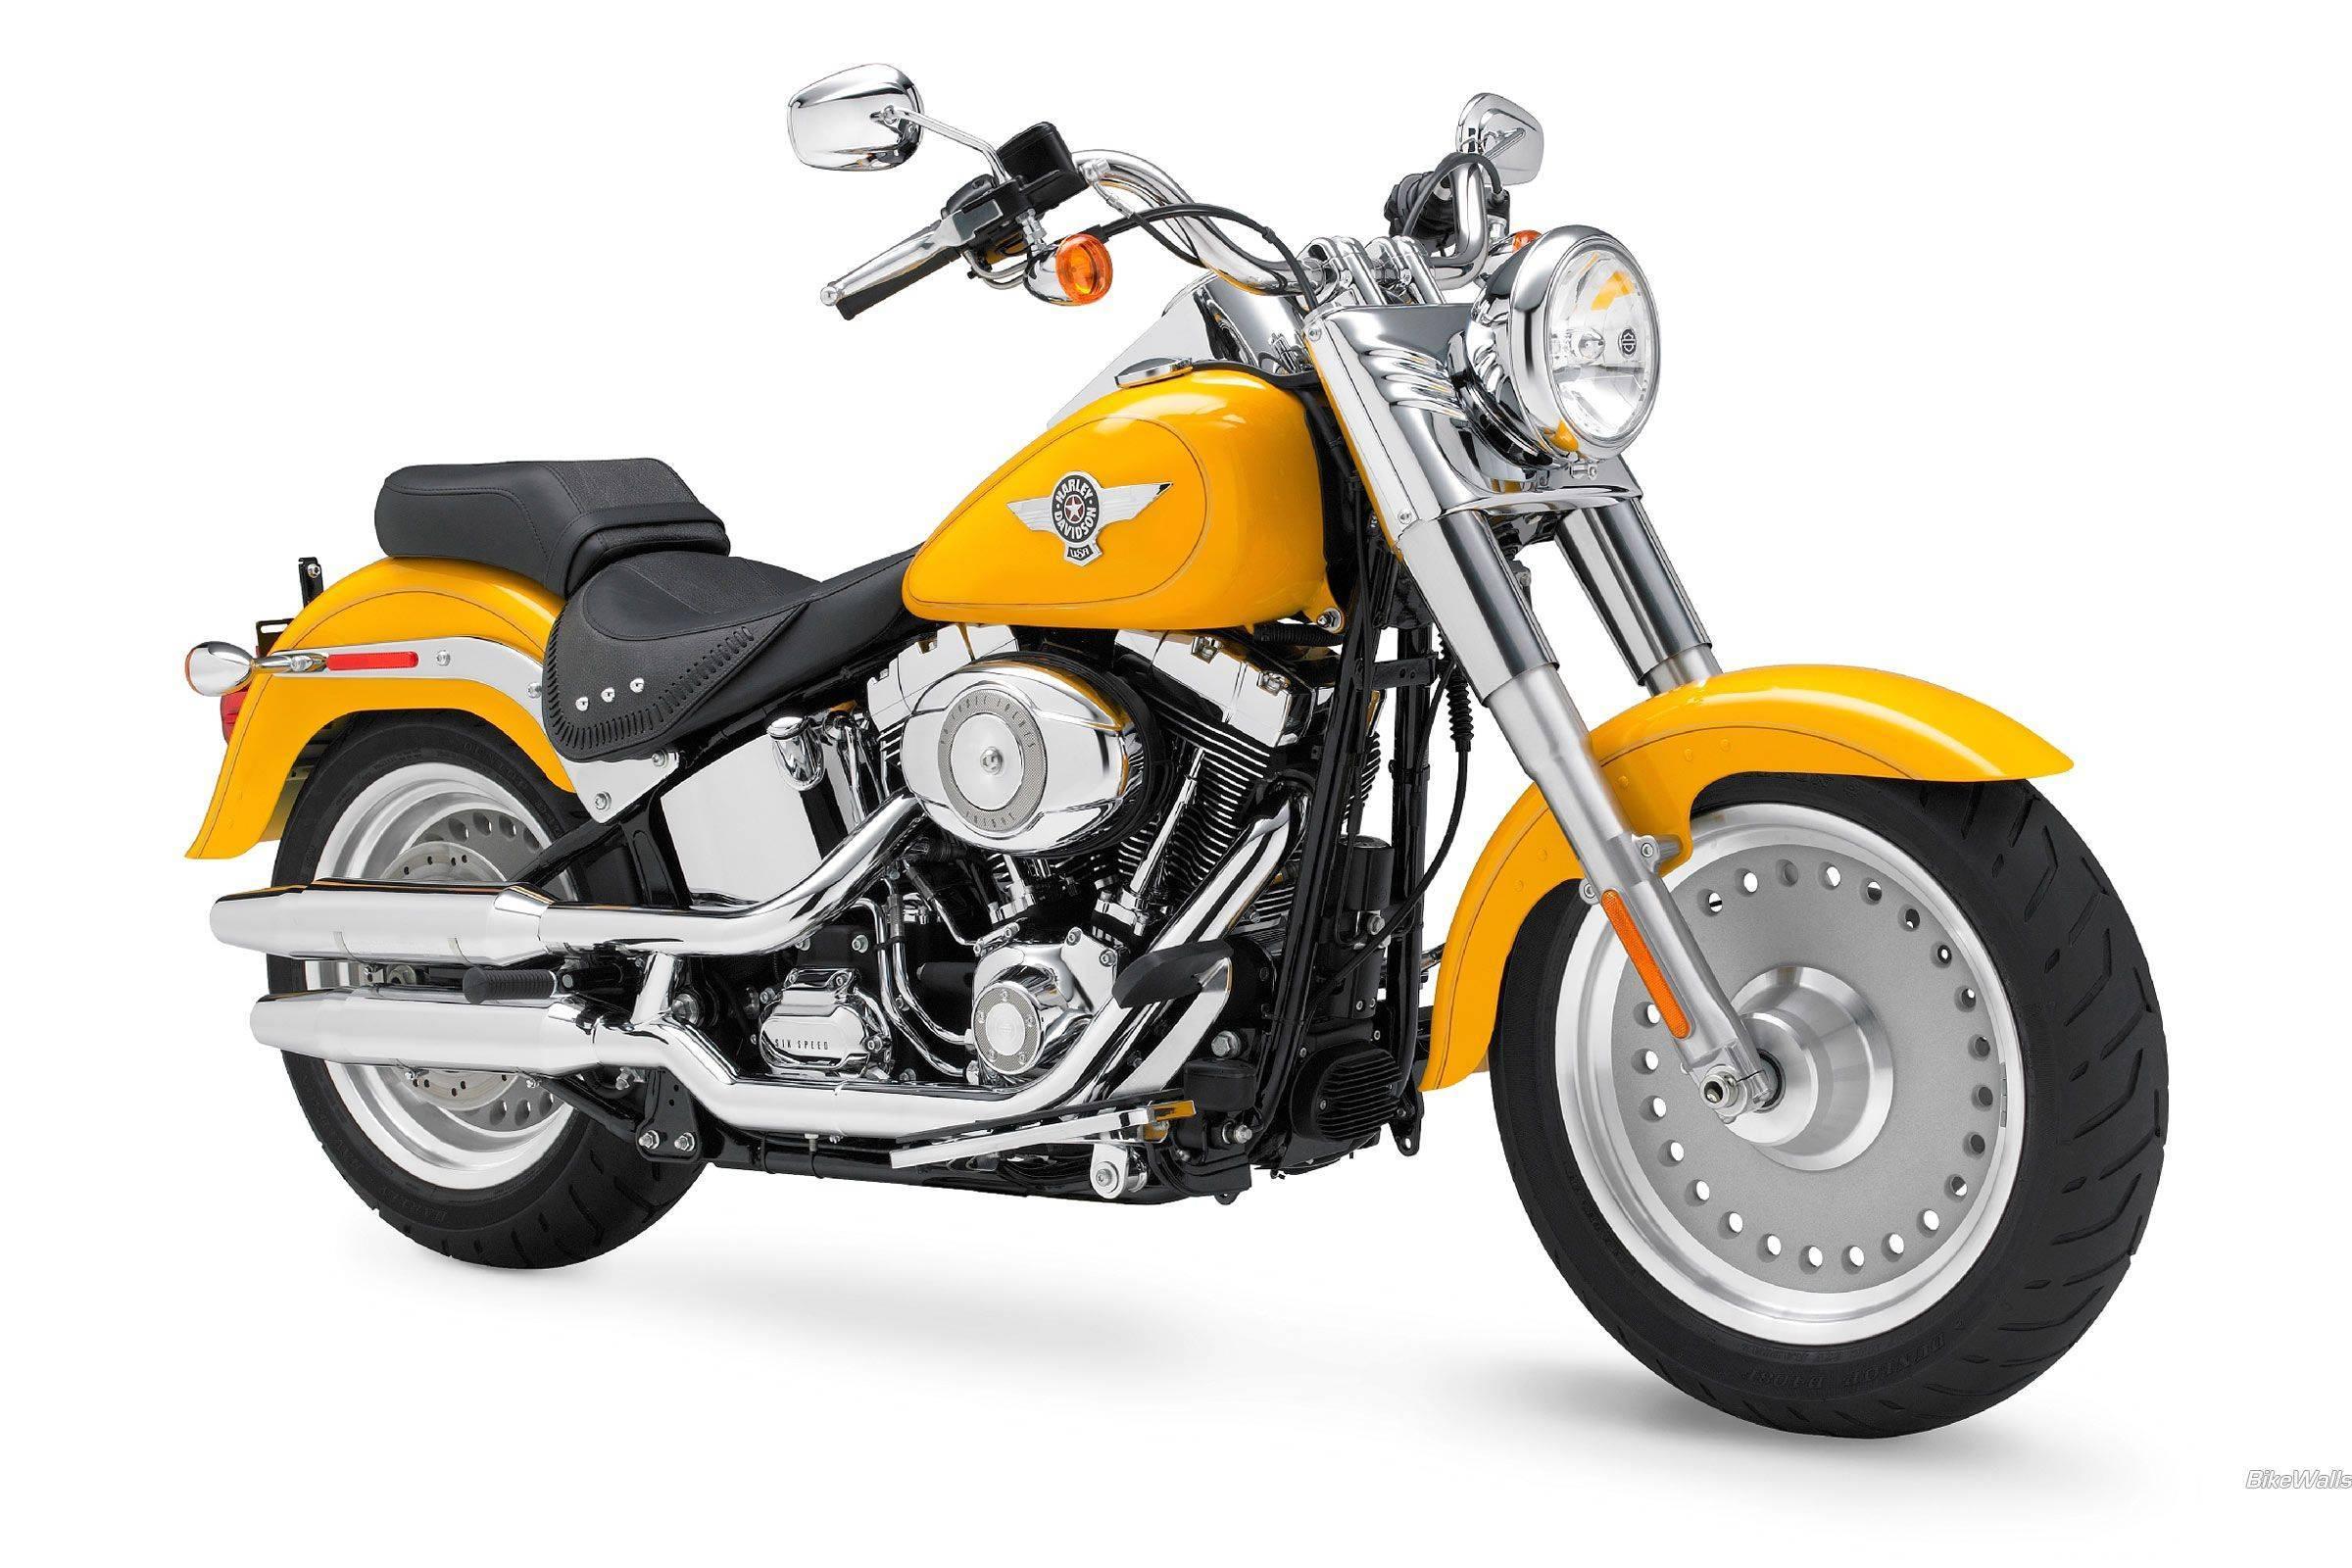 страховка на мотоцикл ОСАГО, калькулятор